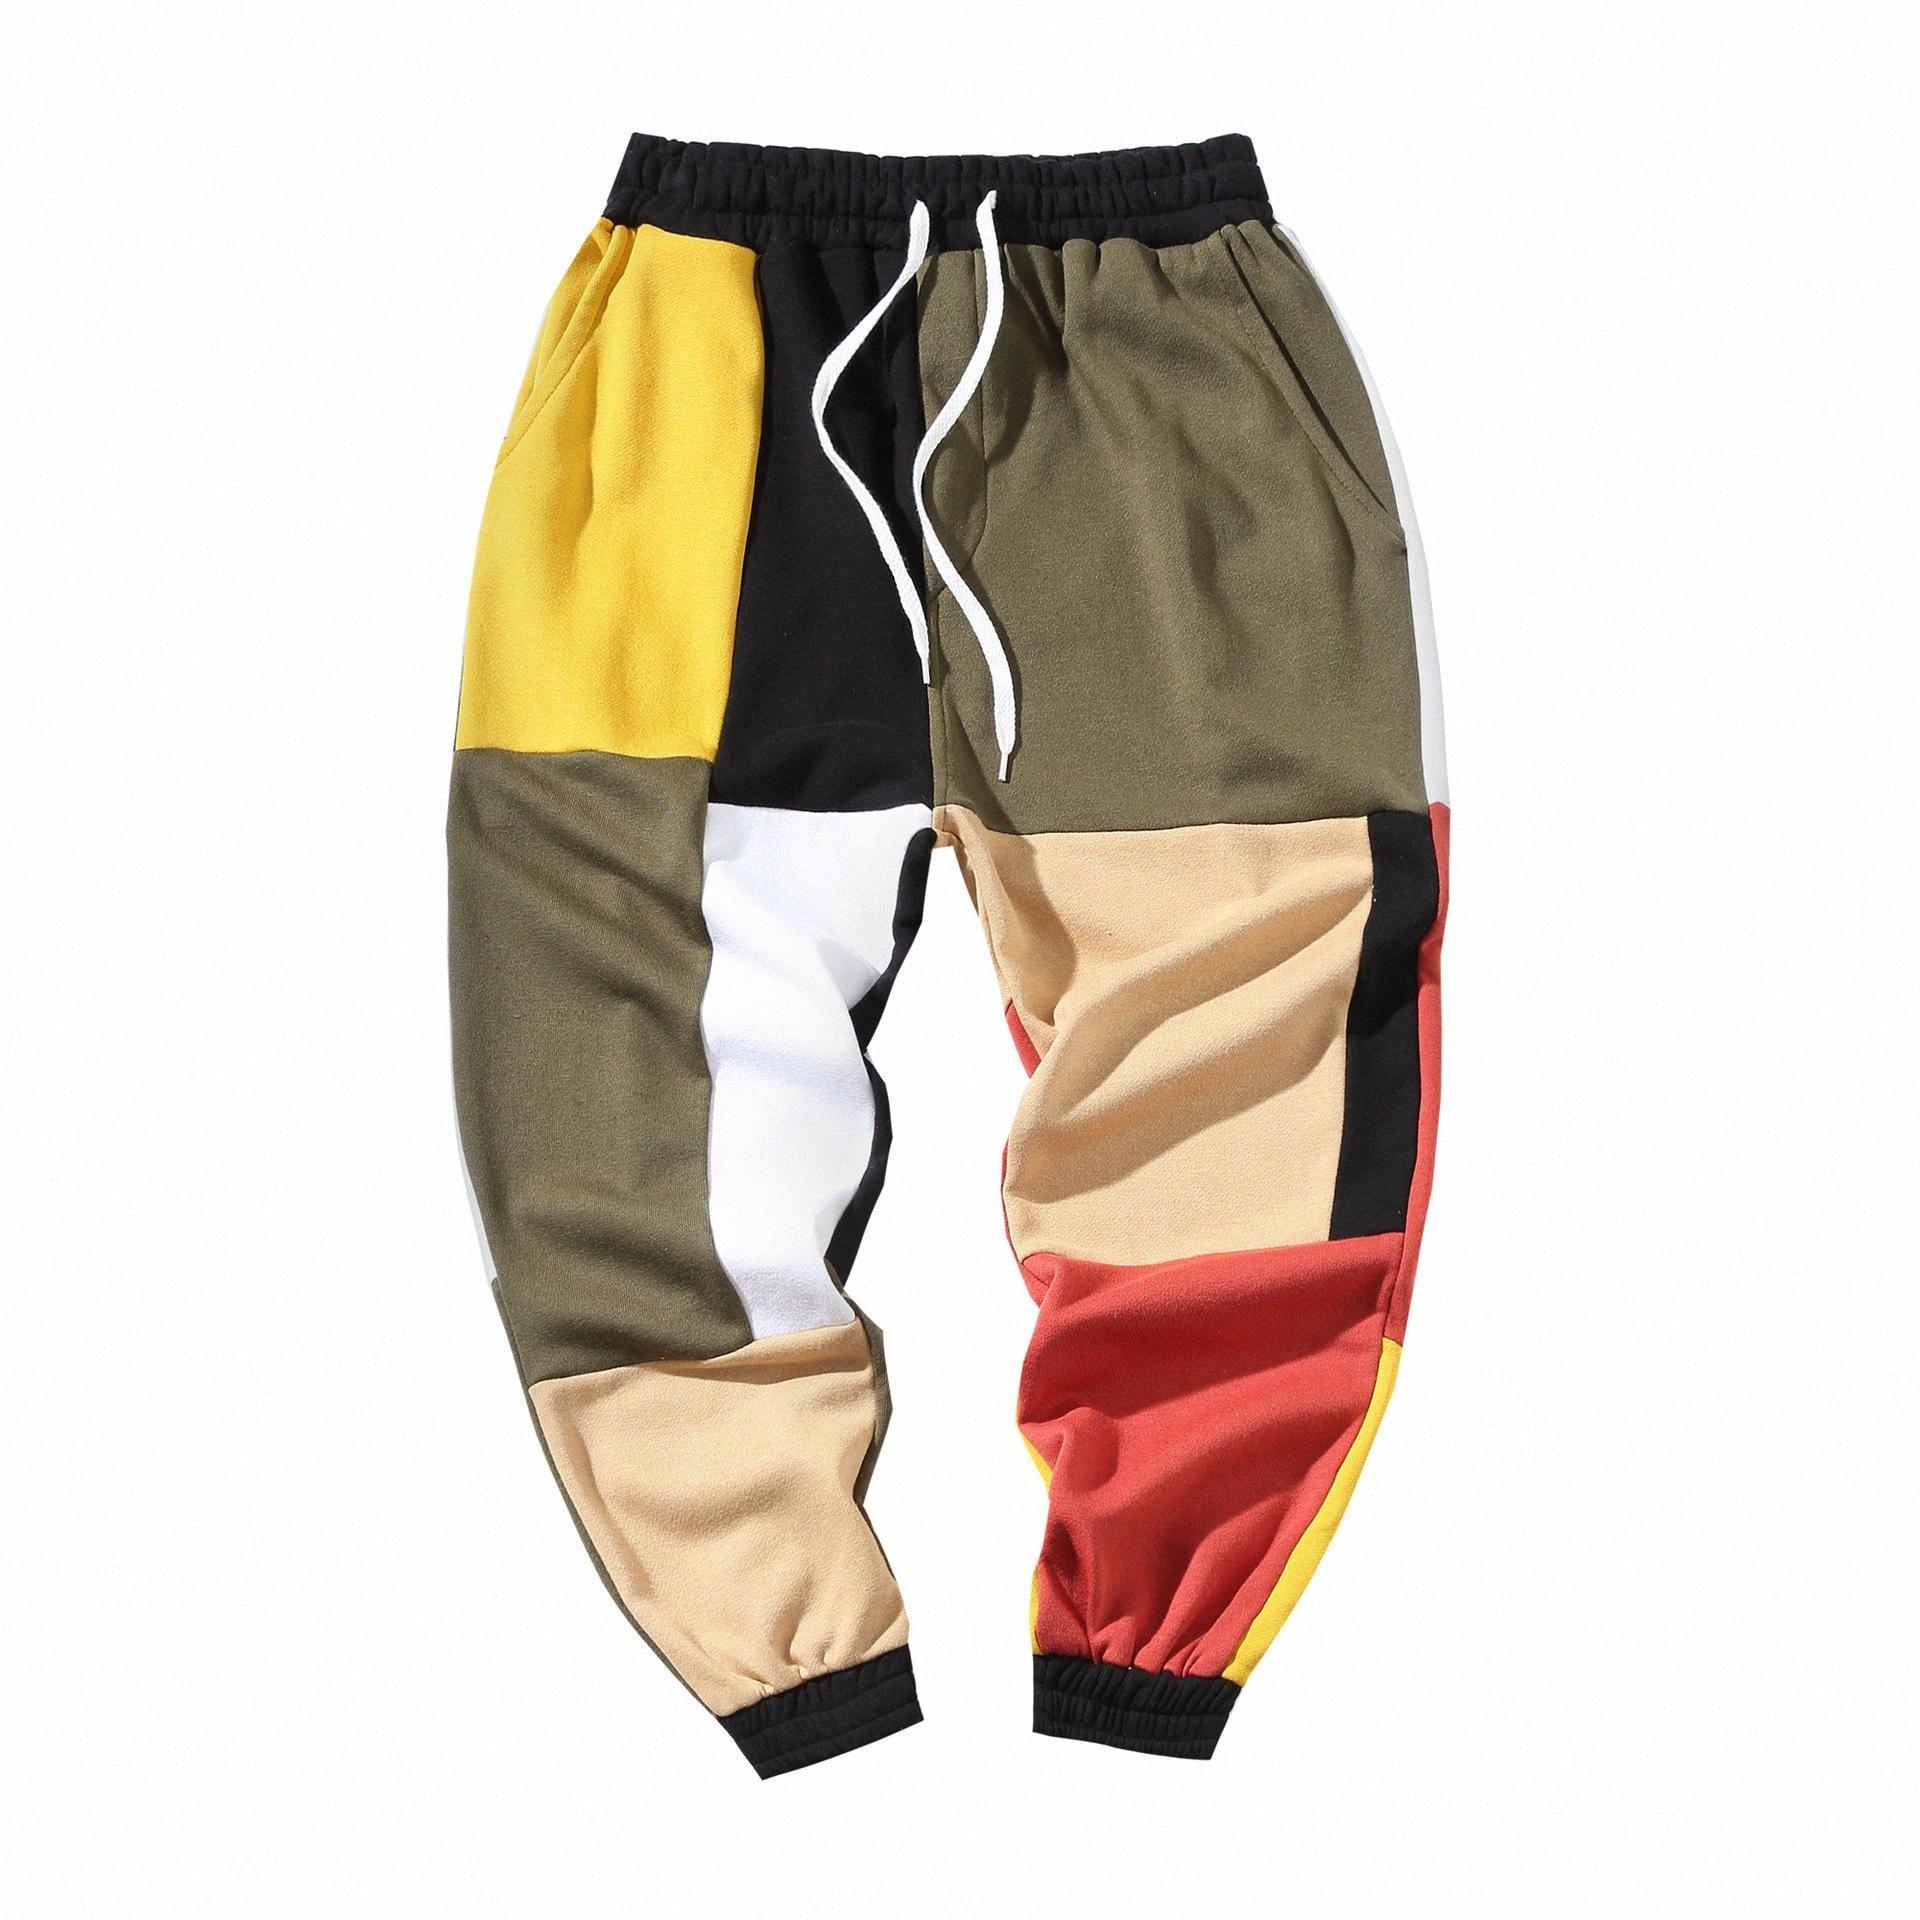 Calças Mens Patchwork Cor Harem Carga streetwear Joggers Casual Calças Calças Masculino Rua Vintage Cotton Sweatpants i24D #